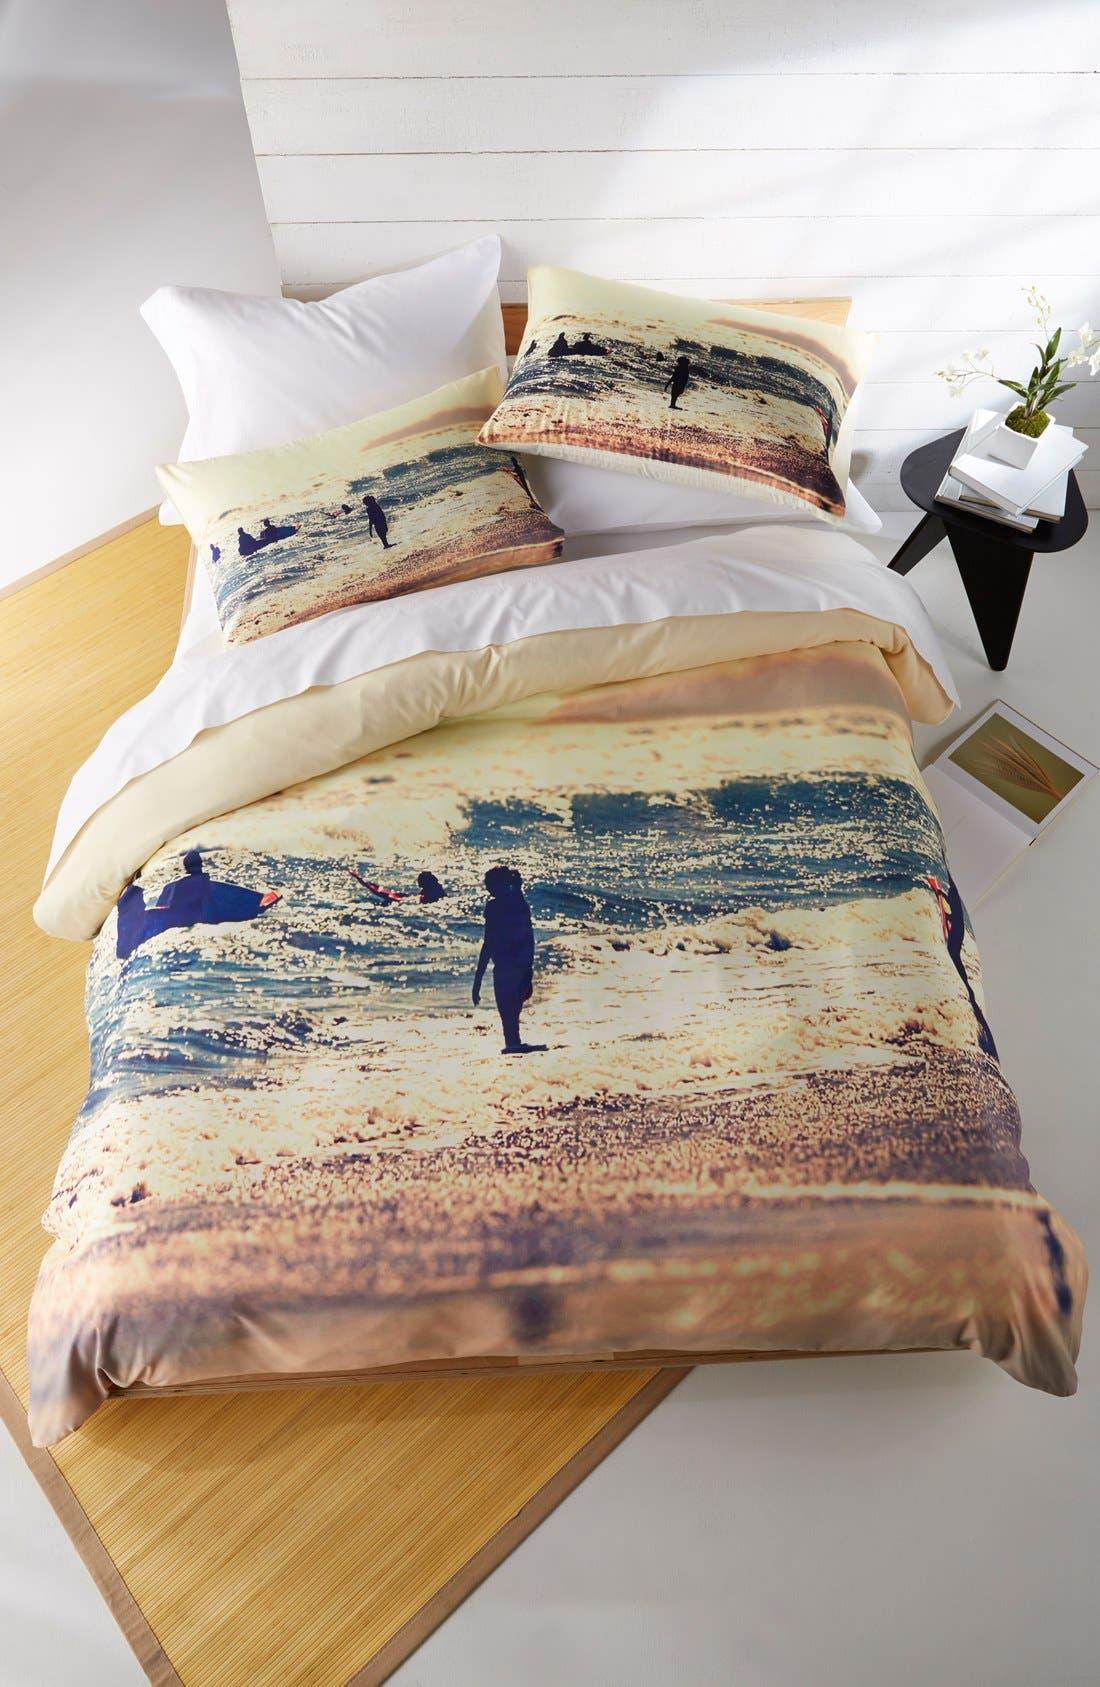 Alternate Image 1 Selected - DENY Designs 'Sunset Surfers' Duvet Cover Set